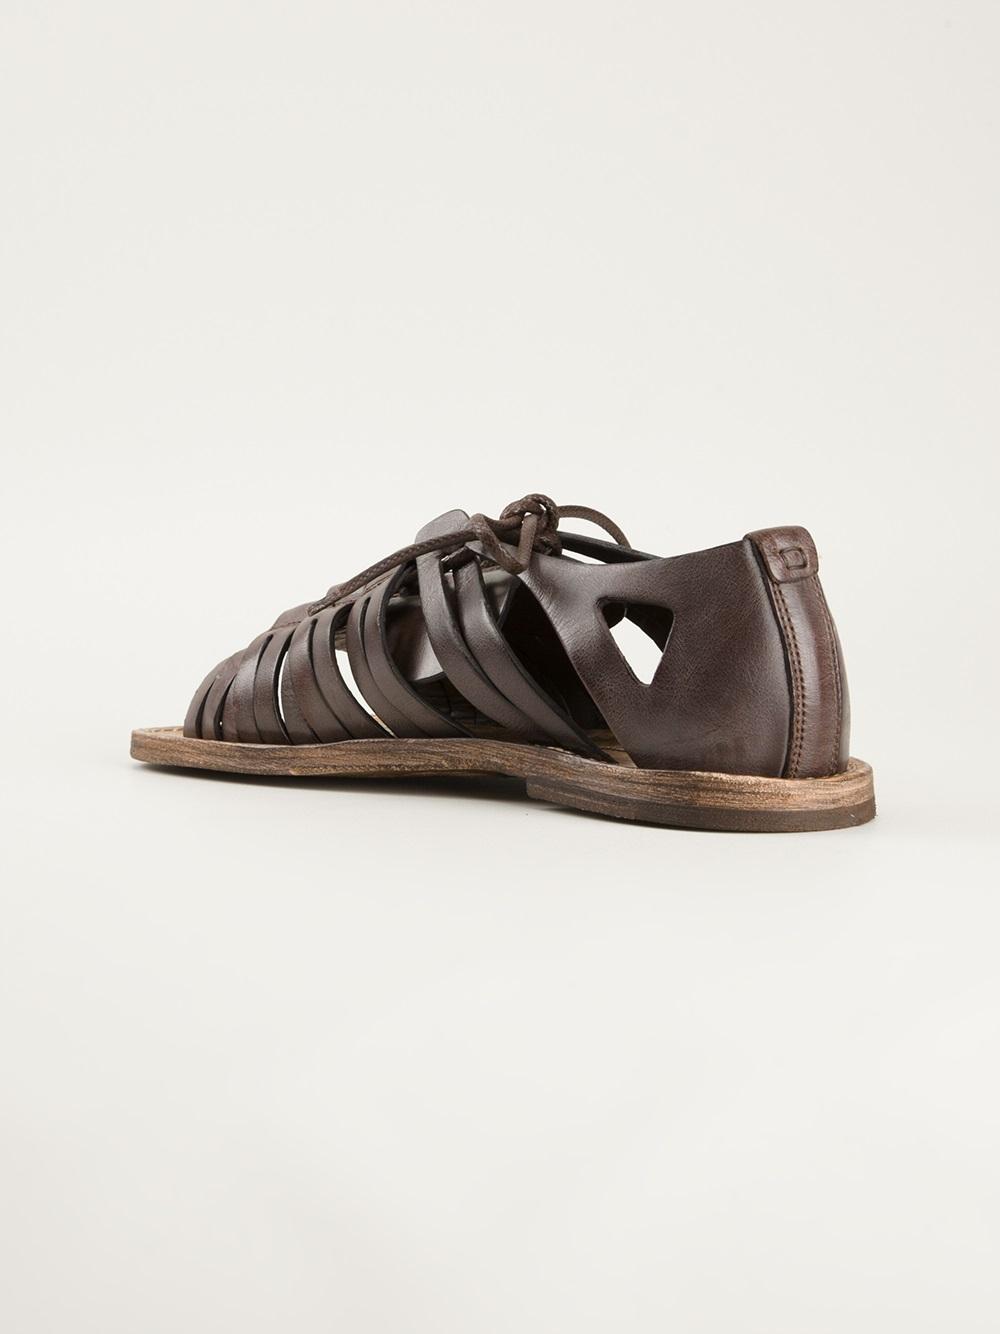 Dolce Amp Gabbana Gladiator Sandal In Brown For Men Lyst